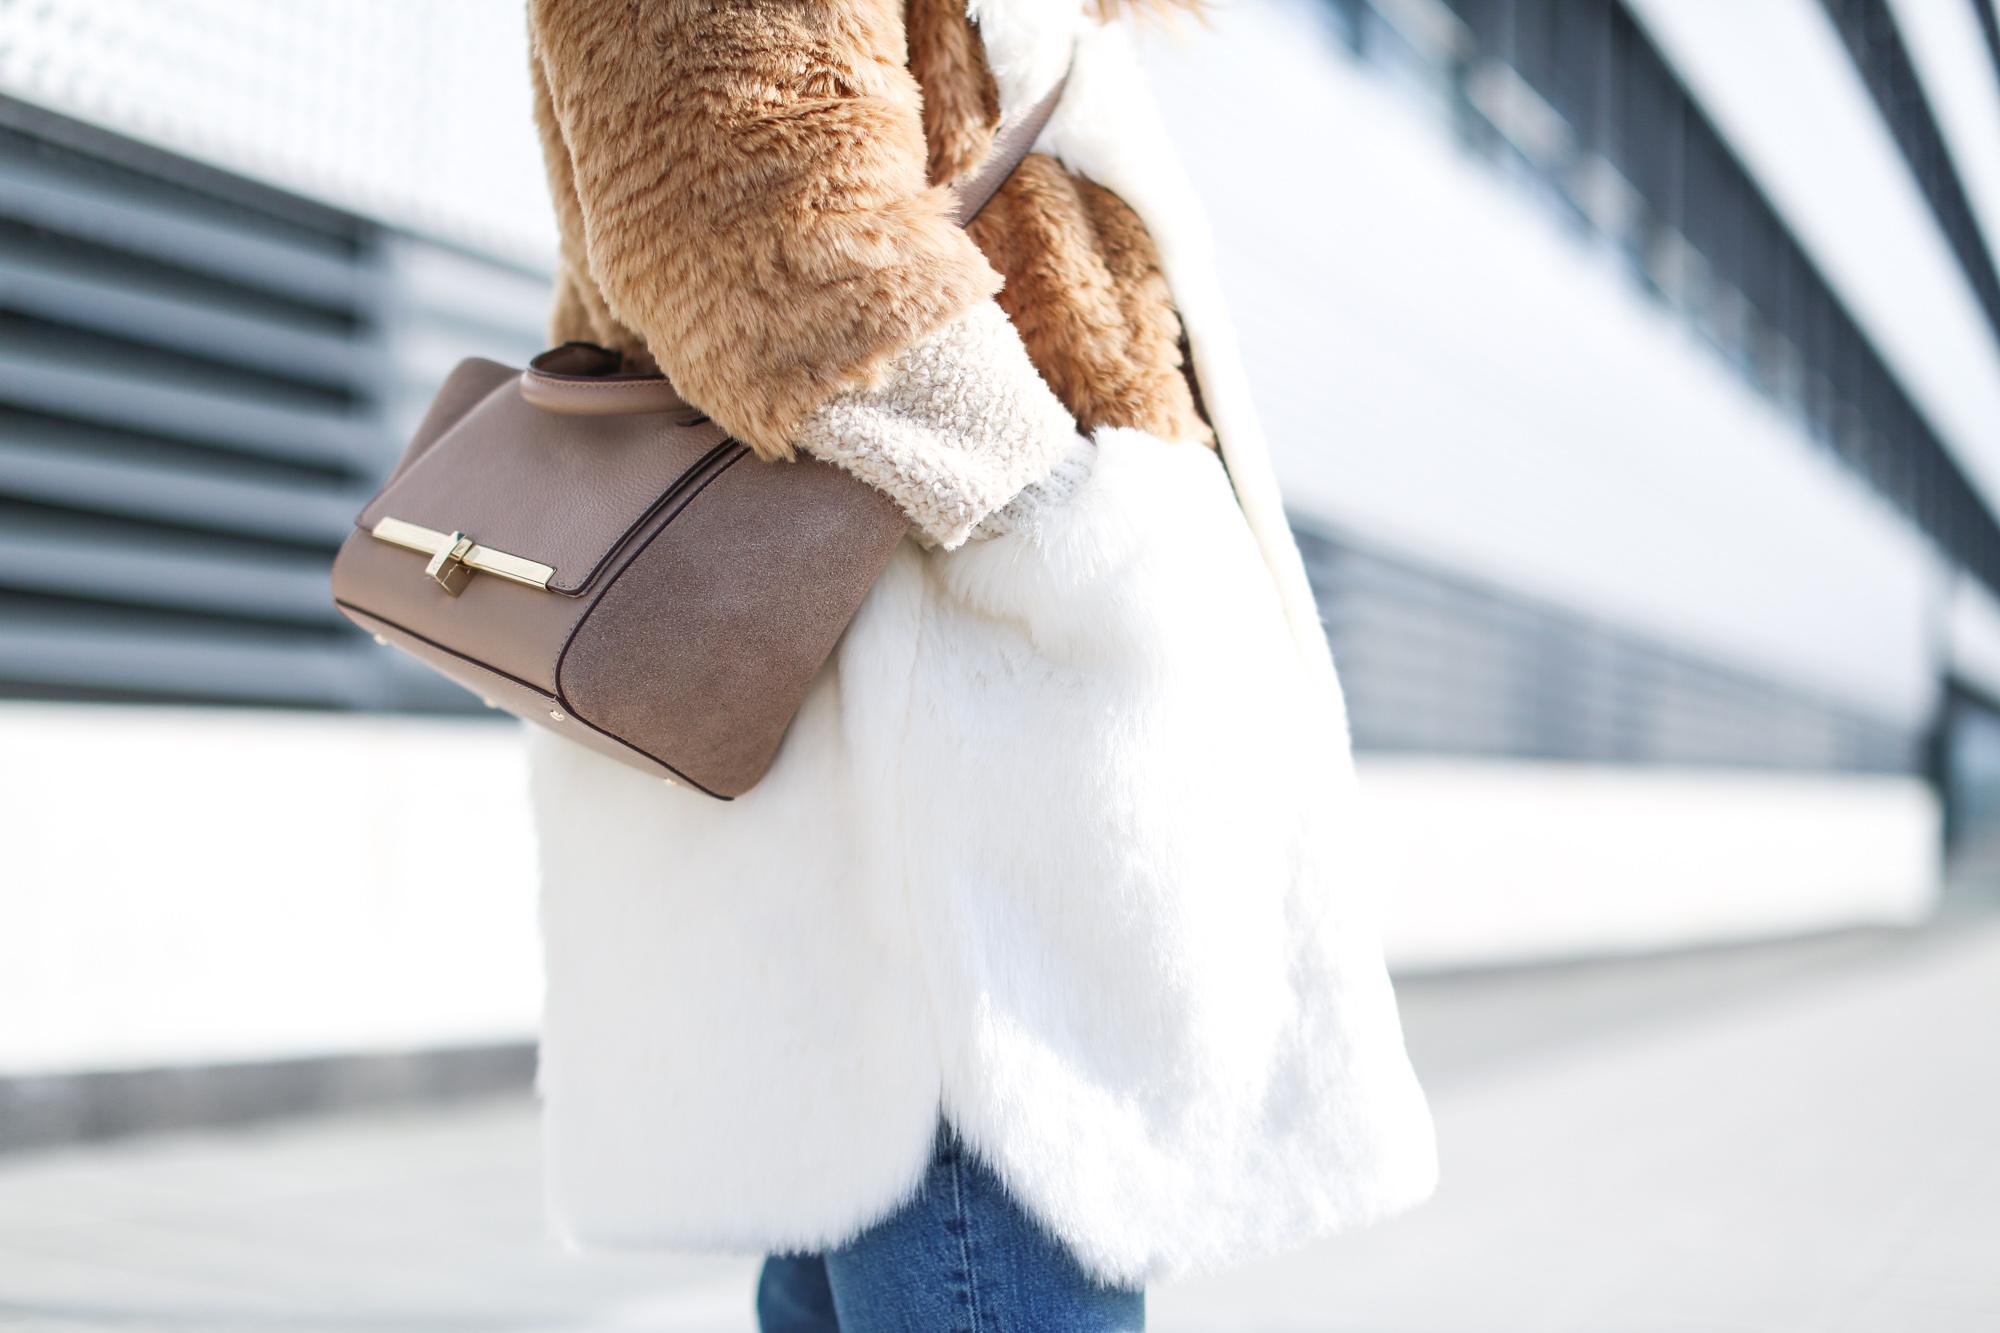 Clochet_streetstyle_fashionblogger_asosfauxfurteddycoat_pinkadidashamburg_leztinstreet_acnestudiosjeans_pop-6